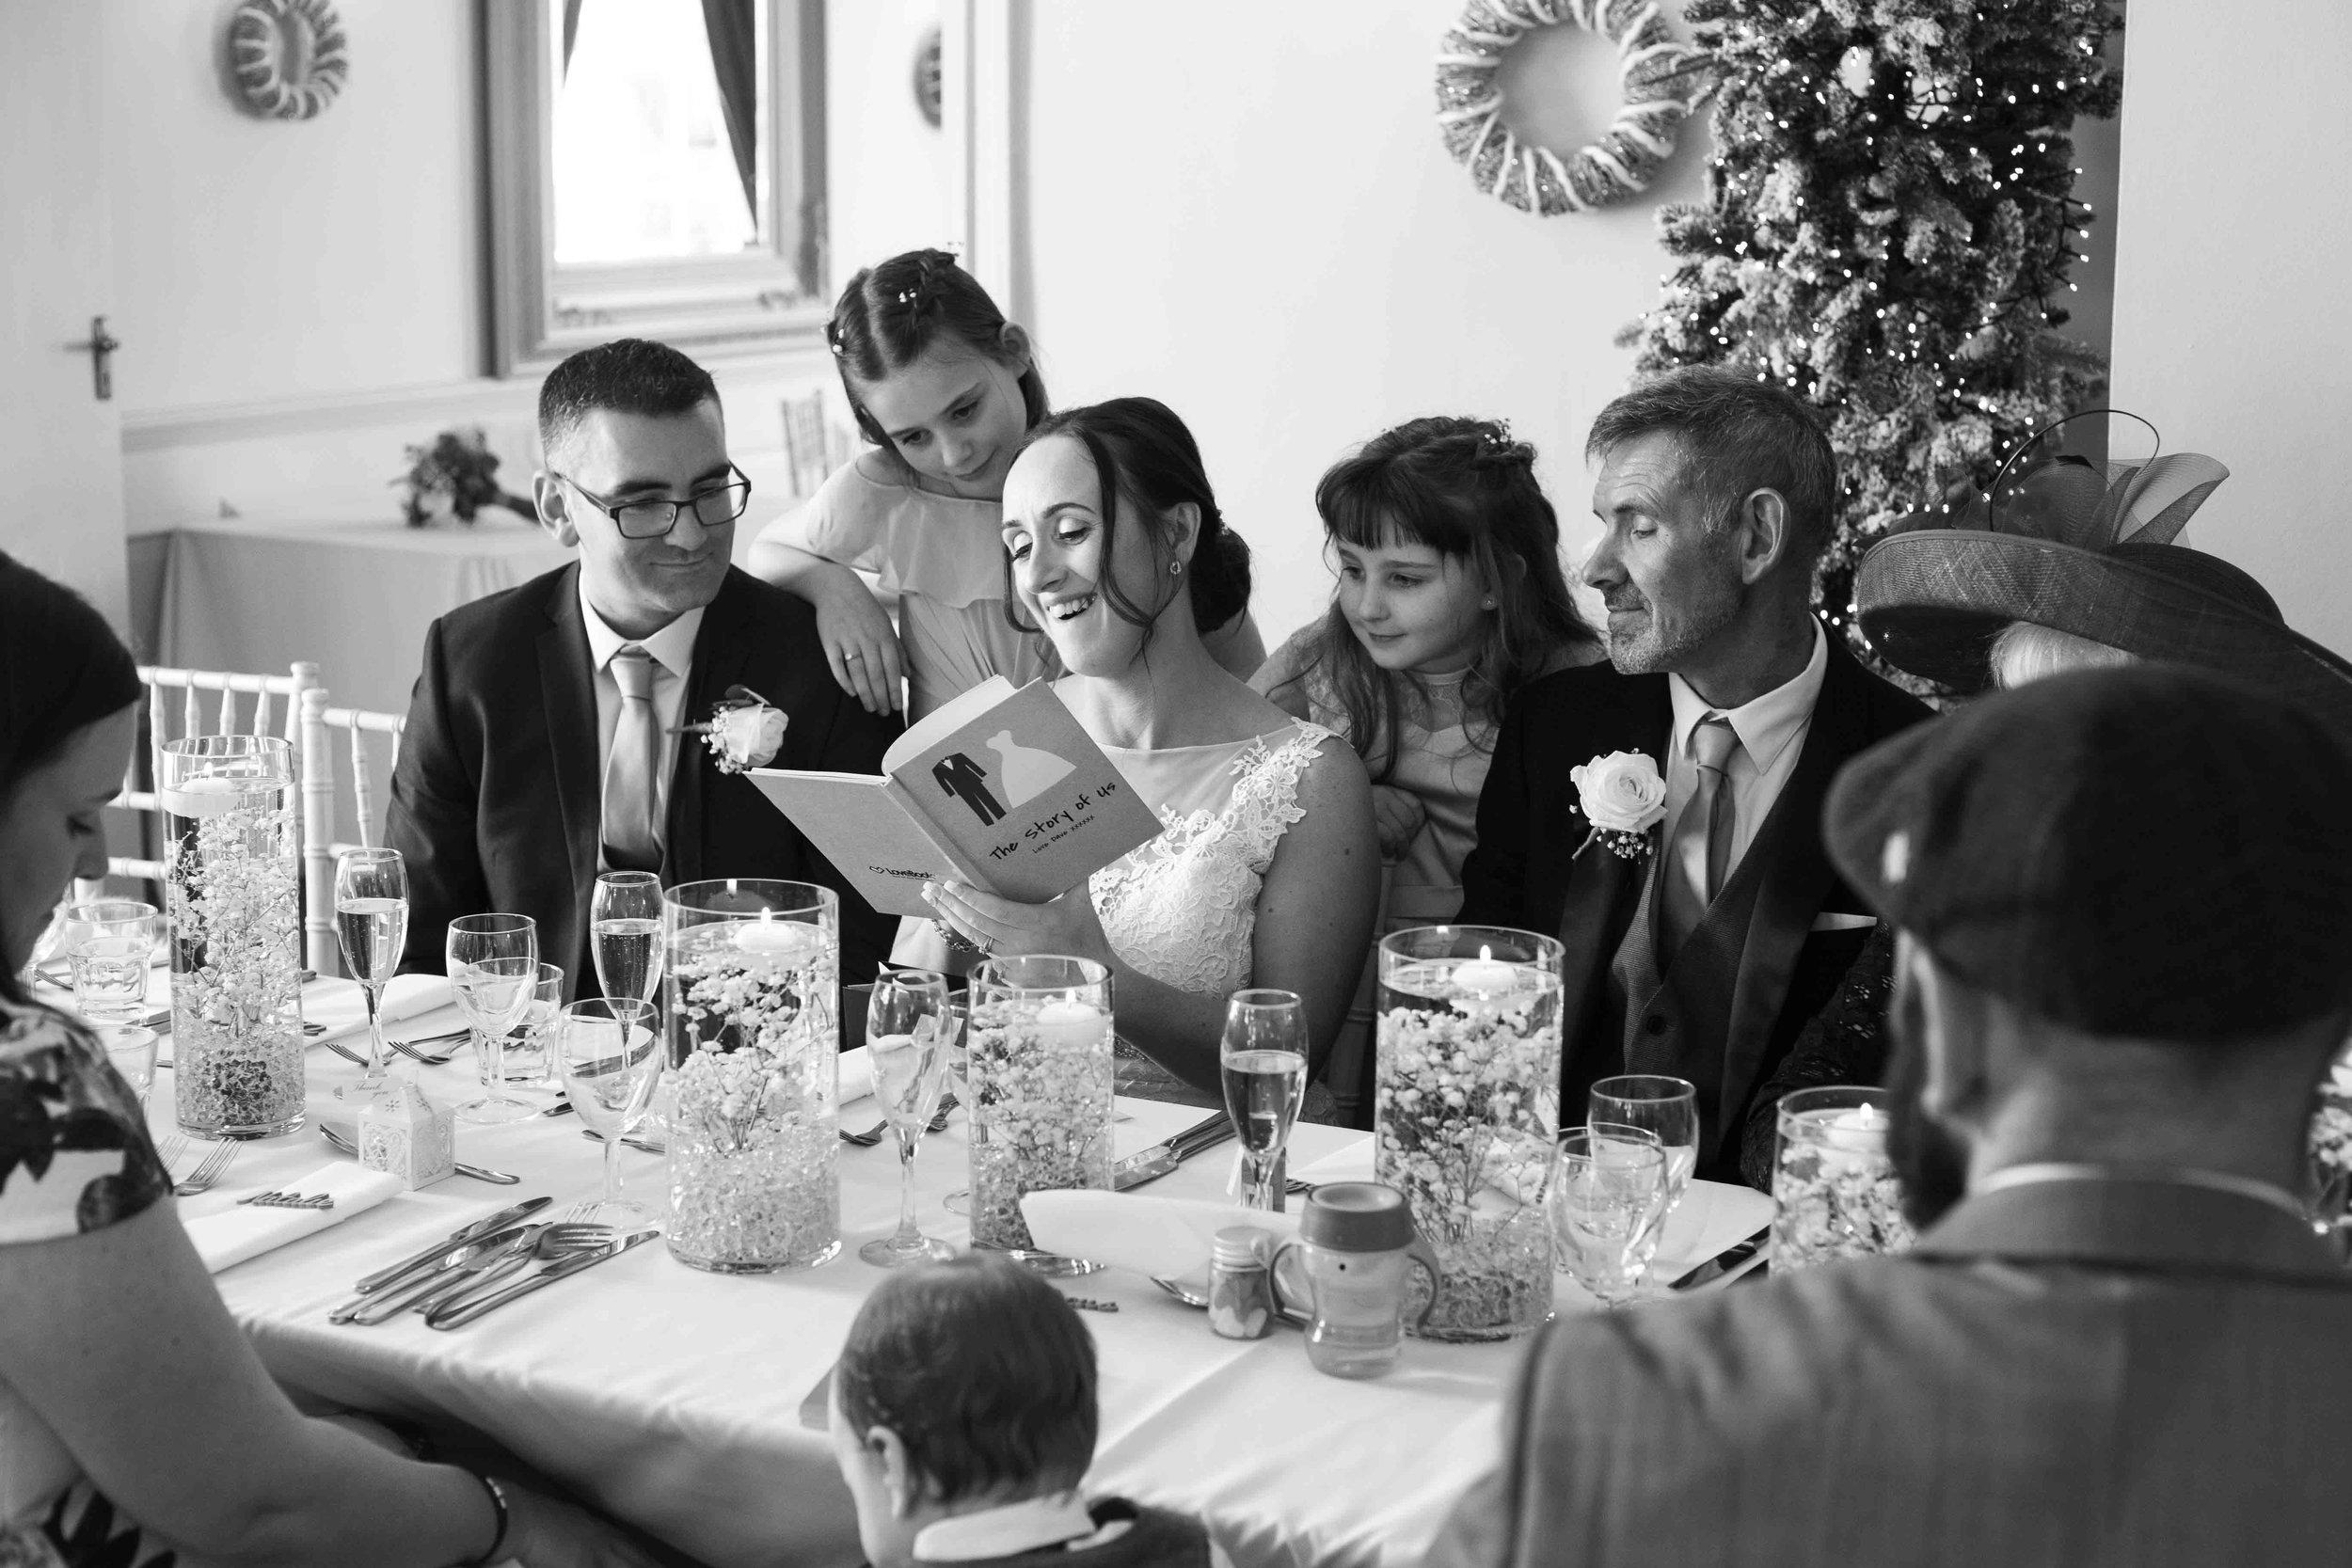 wedding-photos-willenhall-wedding-photographer-wolverhampton-wedding-photographer-west-midlands-wedding-photographer-birmingham-wedding-present-book.jpg